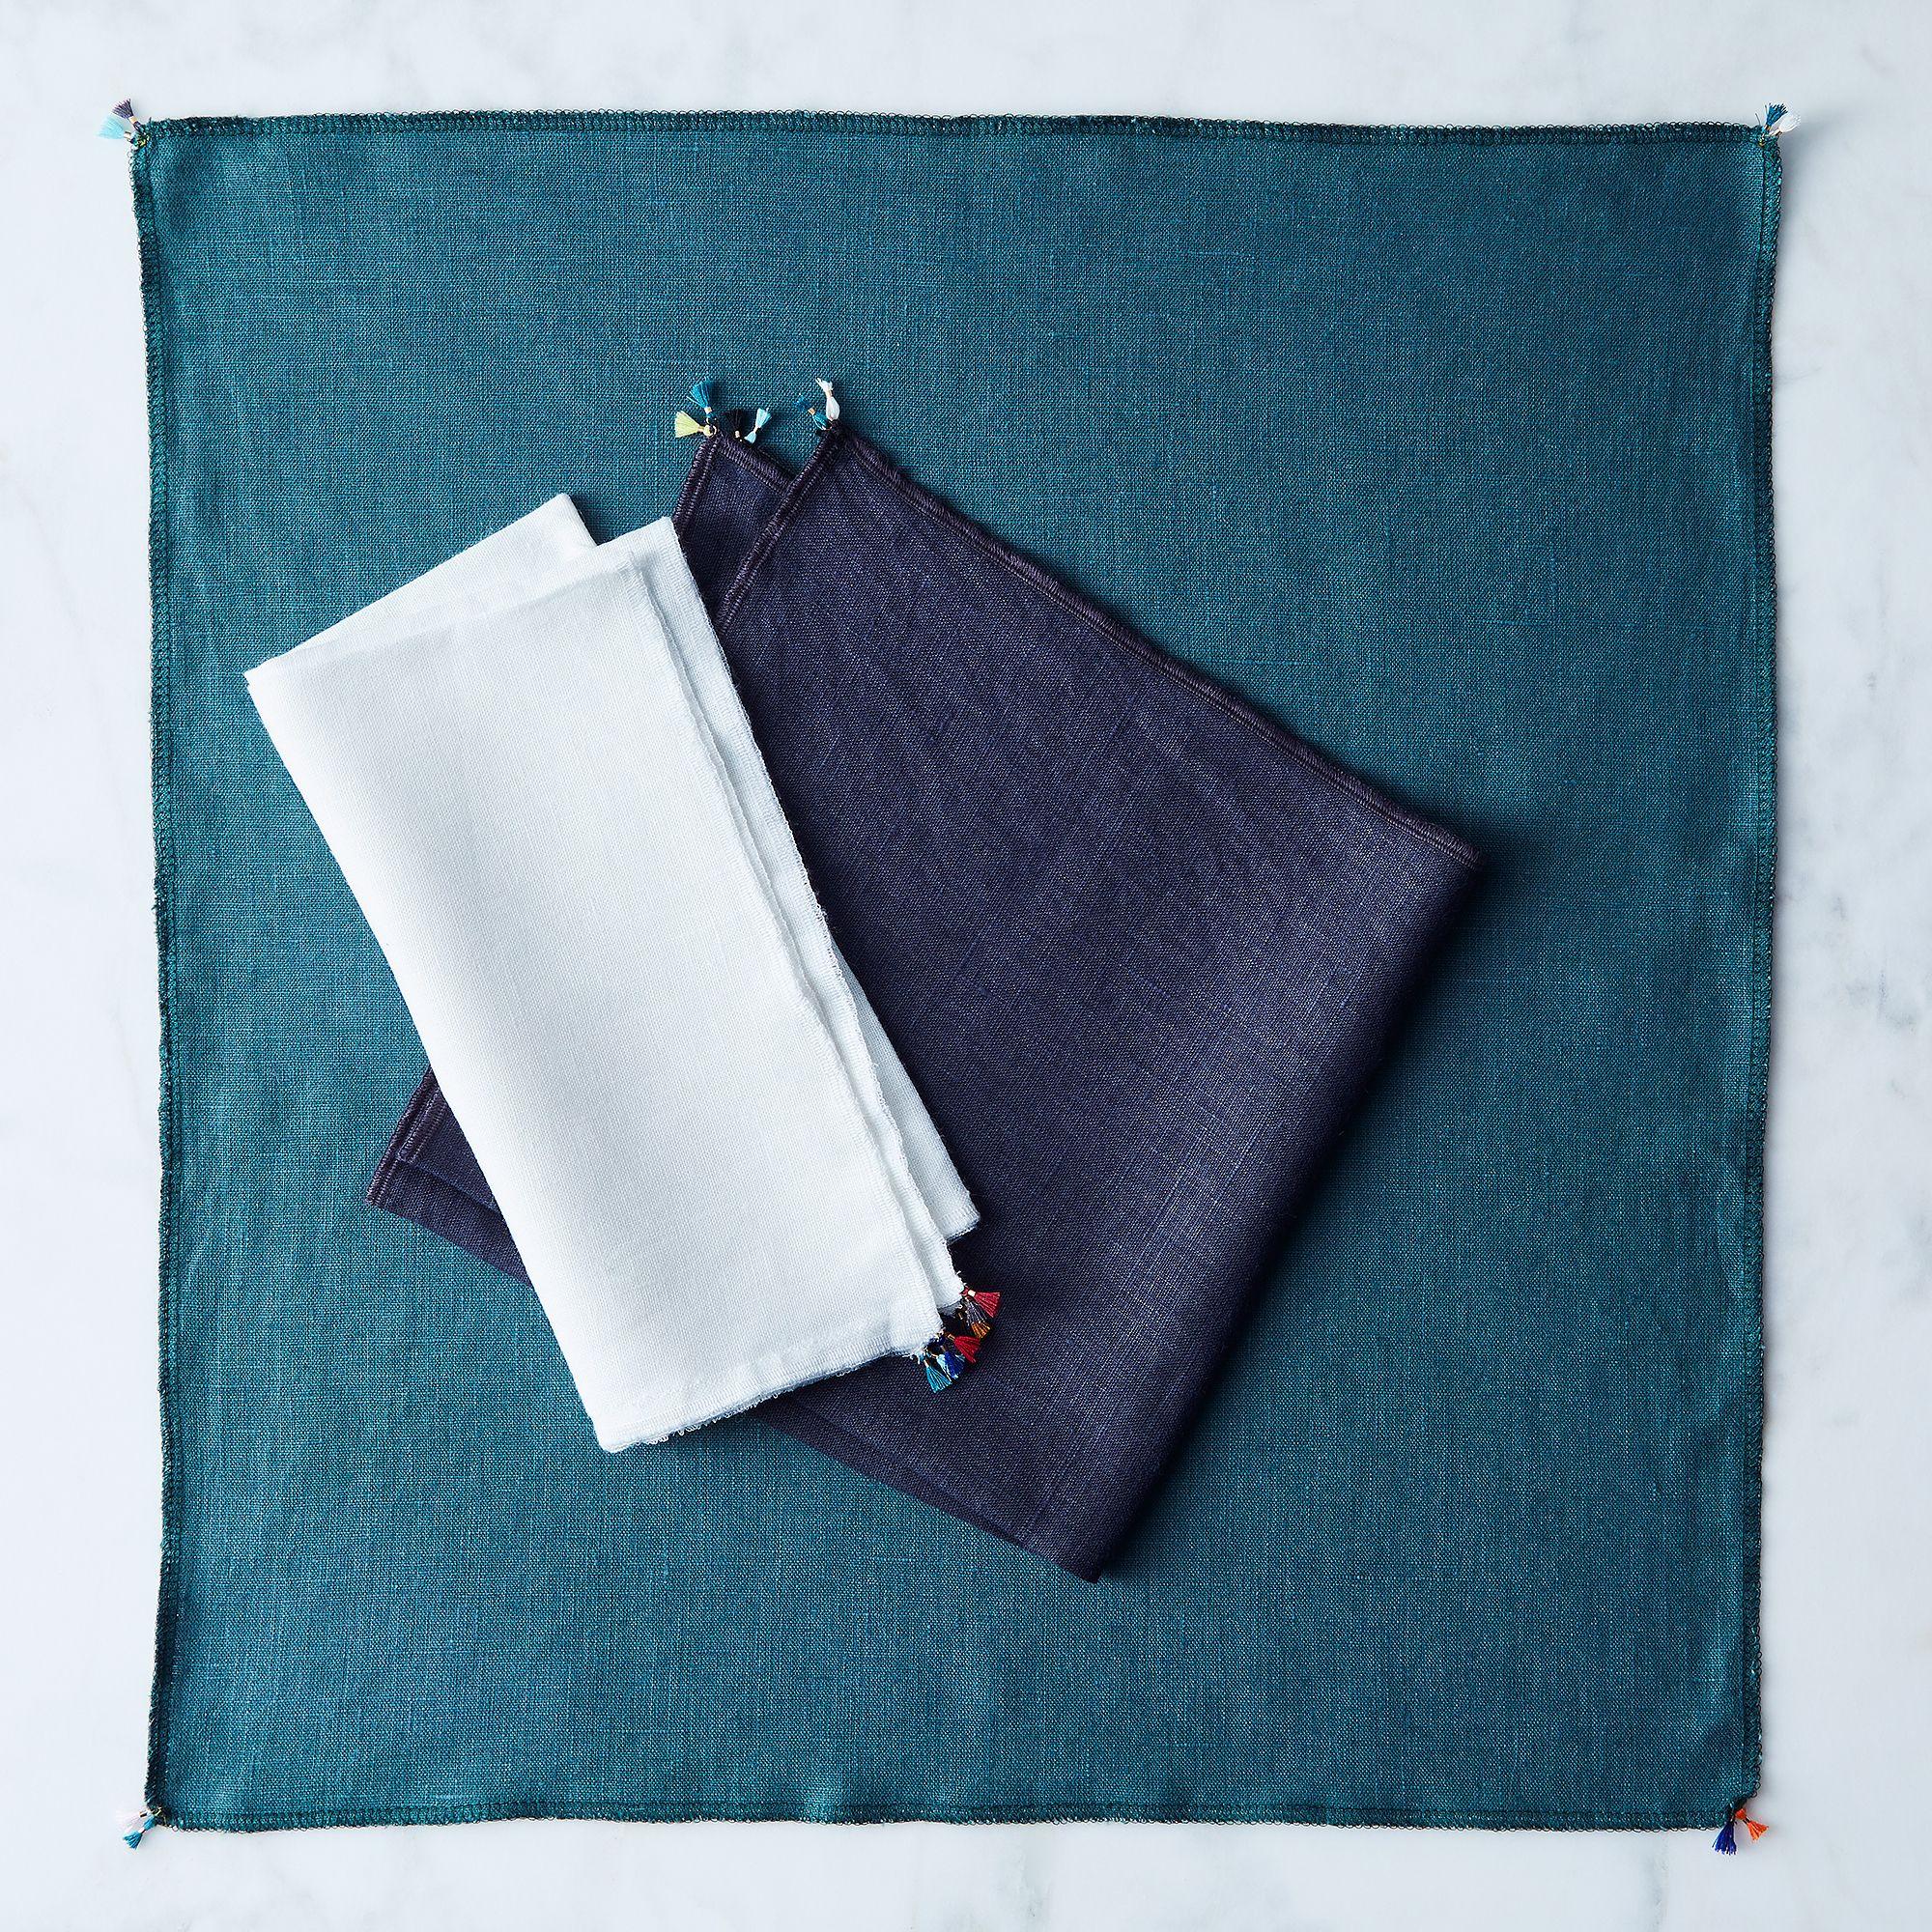 Da6b92ad 60f8 4c9b 8a46 59139c2b4375  2017 1004 celina mancurti furoshiki inspired linen gift wrap colors set of 3 silo ty mecham 006